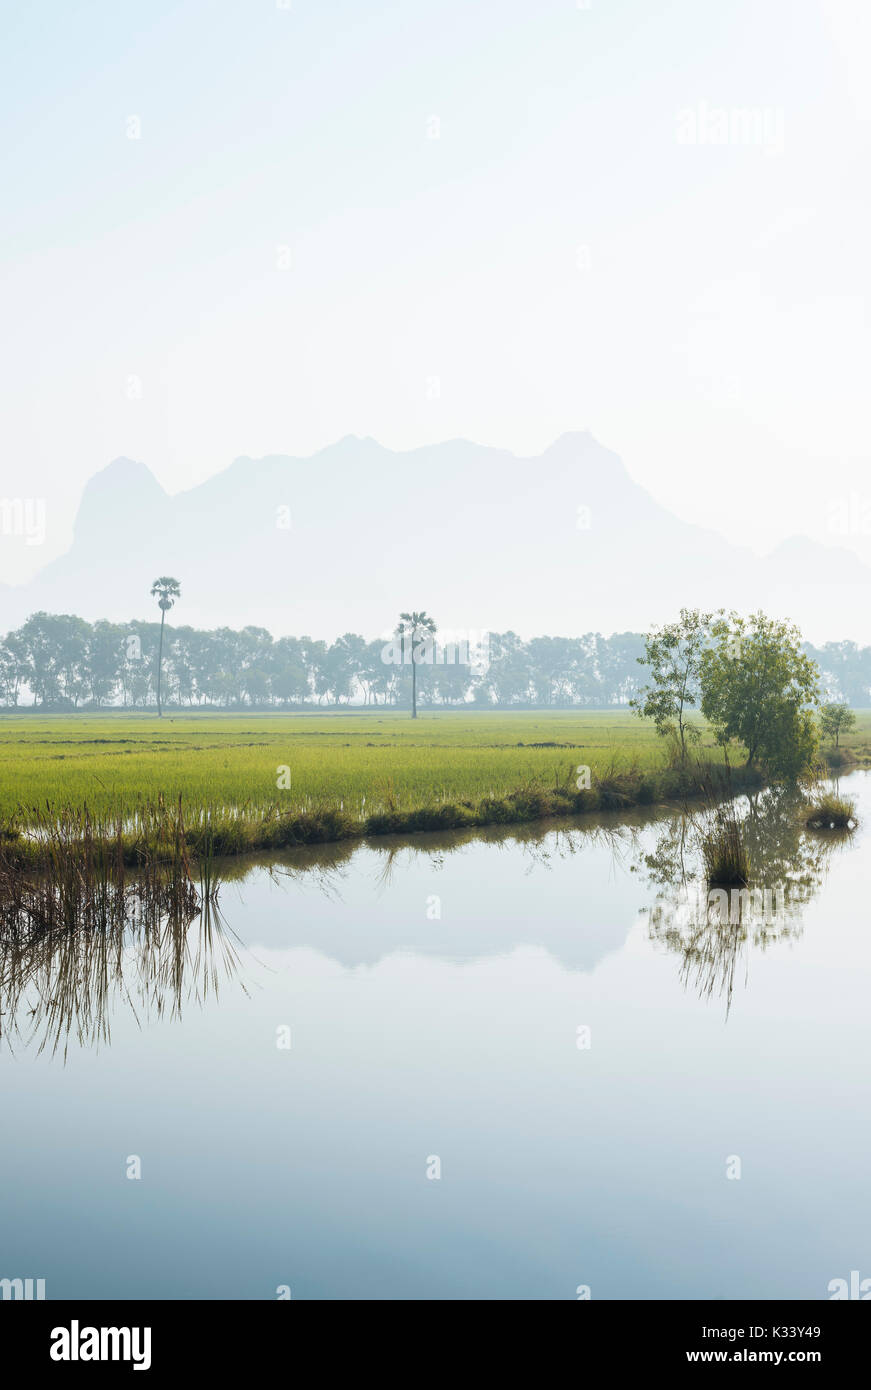 Landscape near Hpa-an, Kayin State. Myanmar, Asia Stock Photo